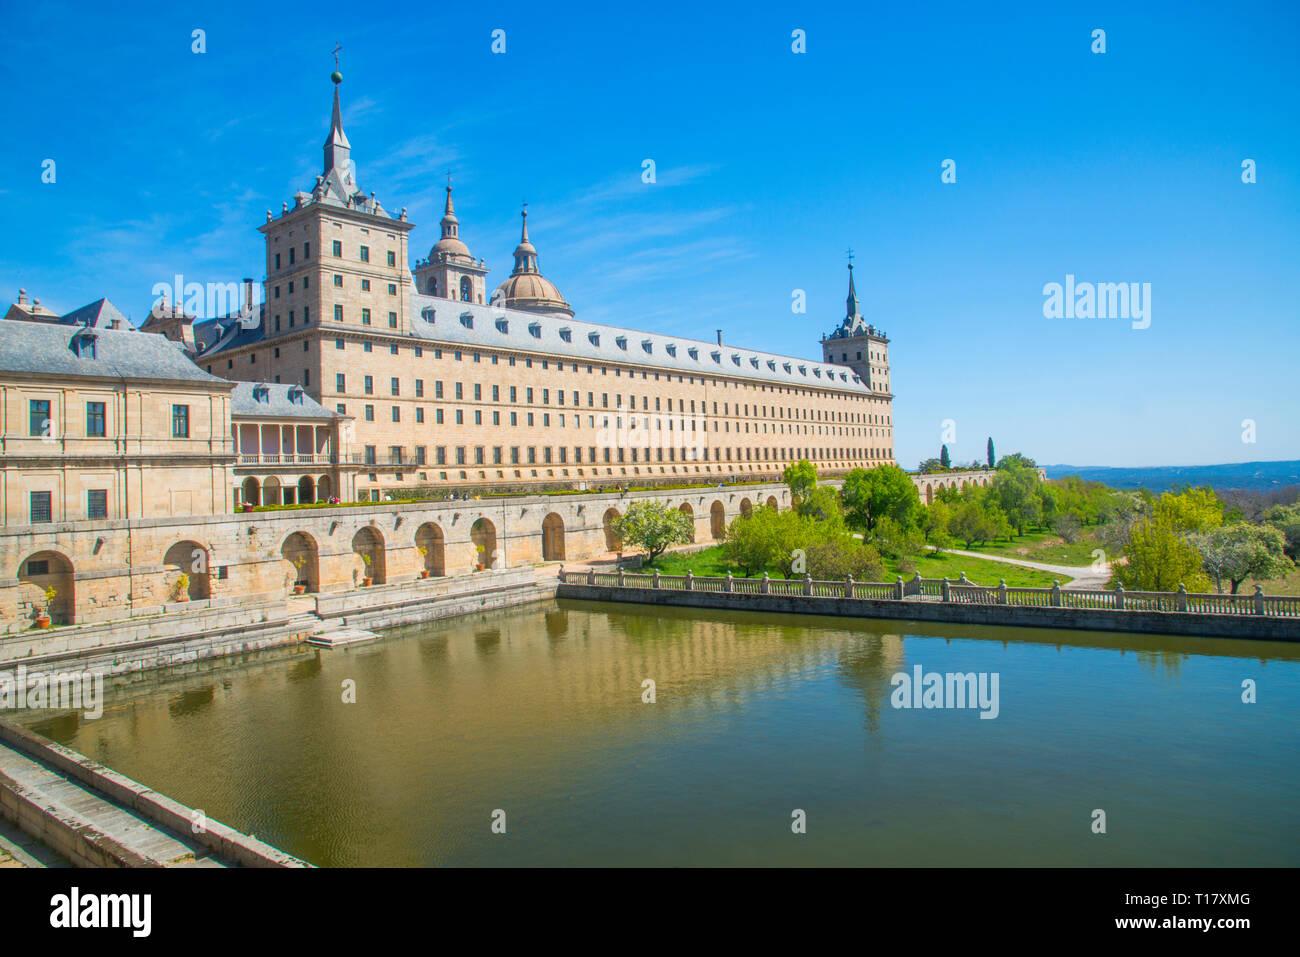 Royal Monastery. San Lorenzo del Escorial, Madrid province, Spain. - Stock Image